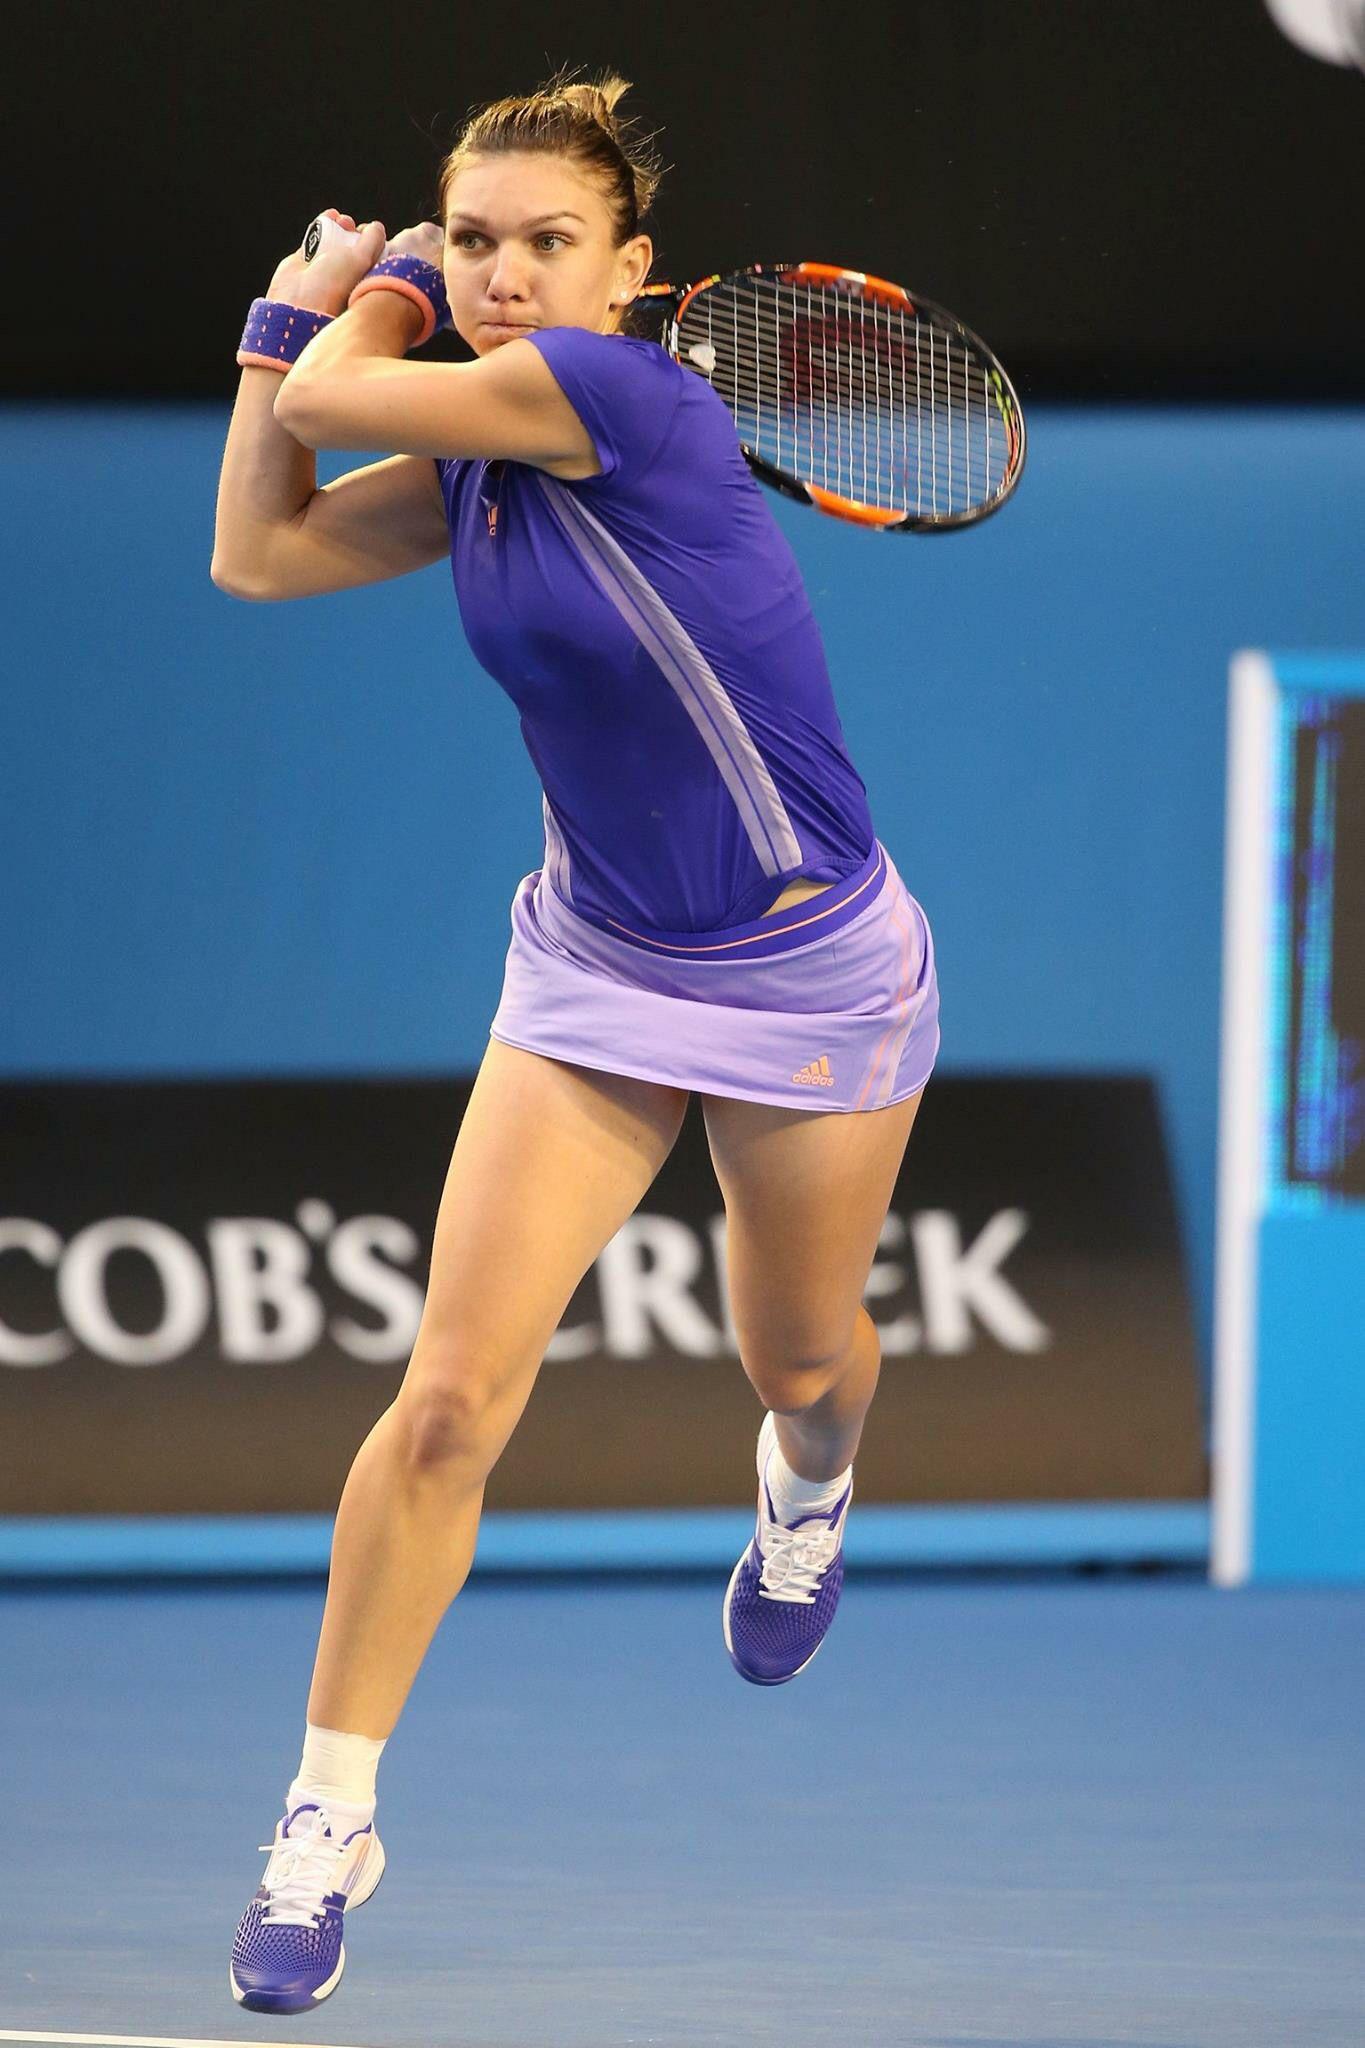 Simona Halep - firt place în the Wild of Tennis în 2018 ...